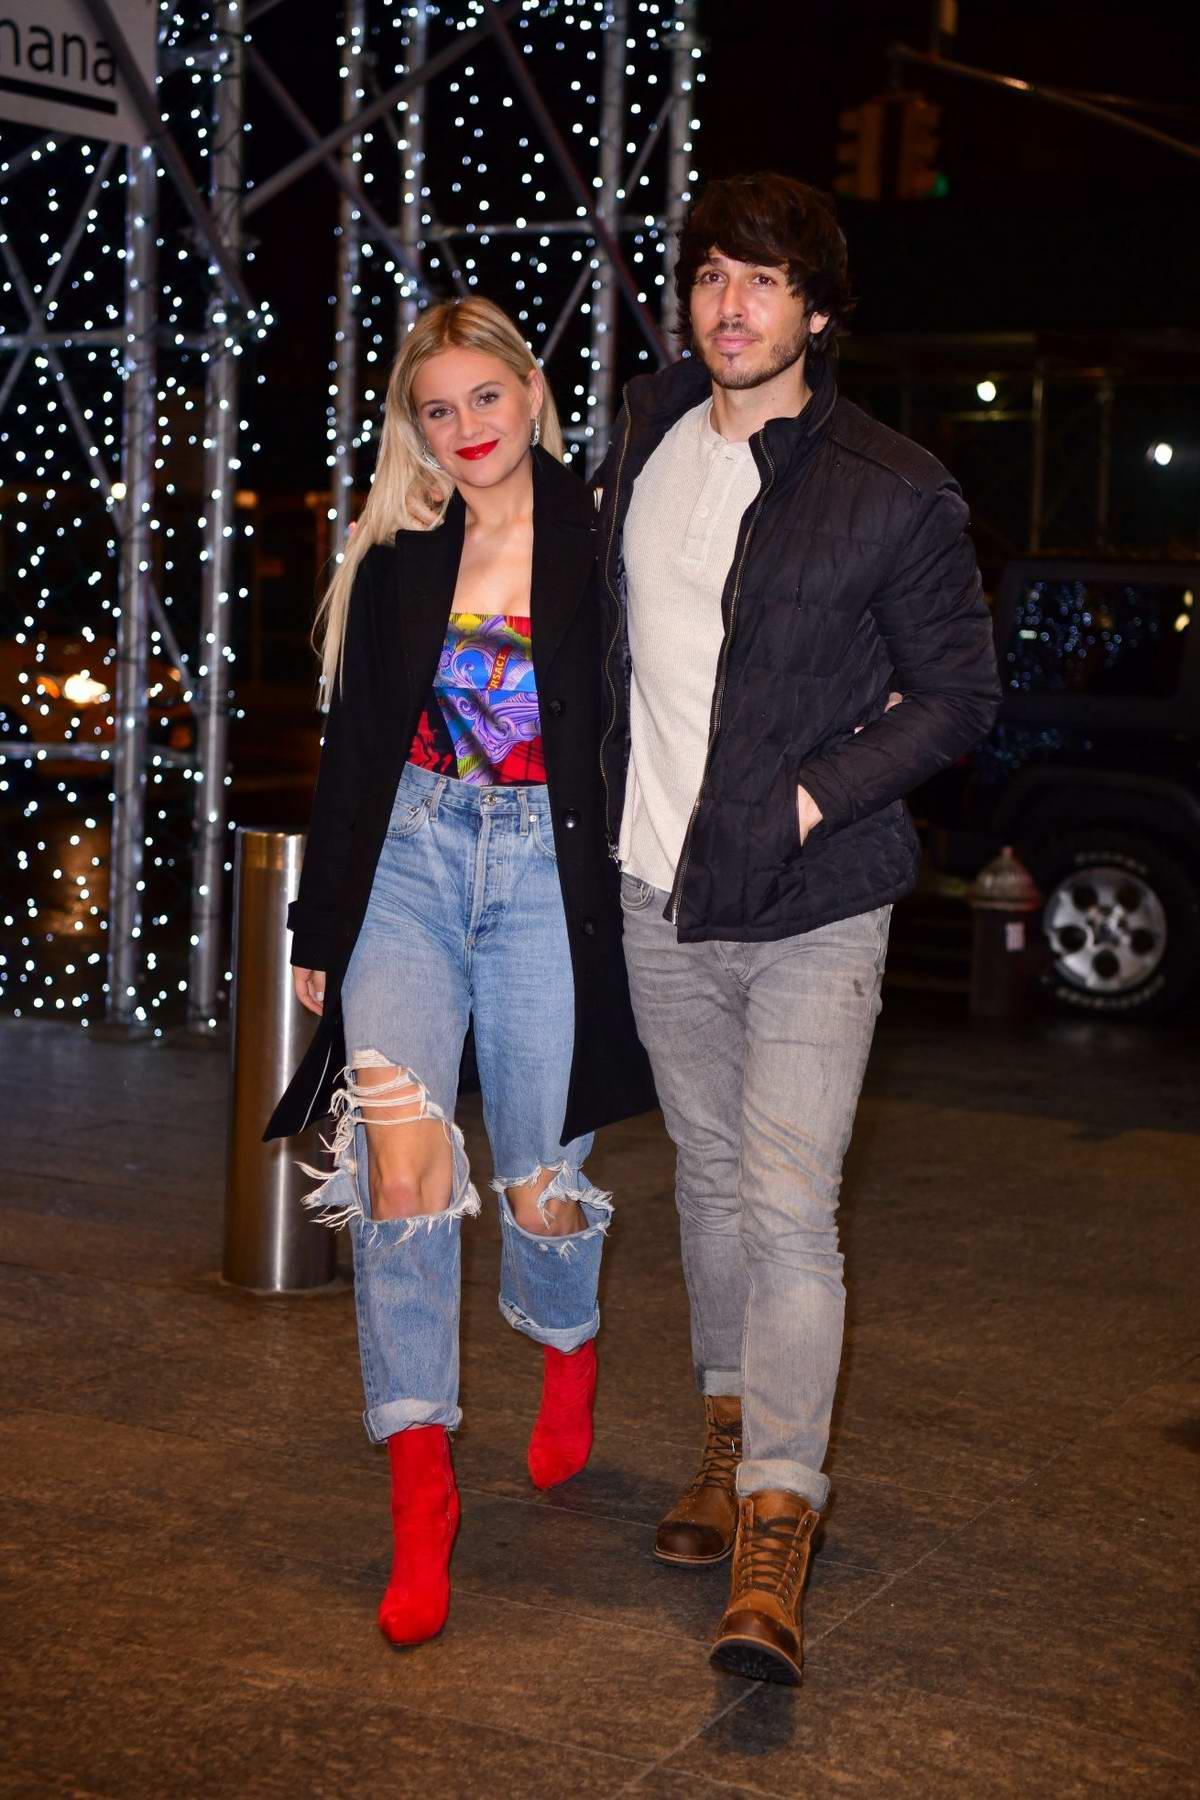 Kelsea Ballerini and Morgan Evans enjoy a date night at Nobu 57 in New York City